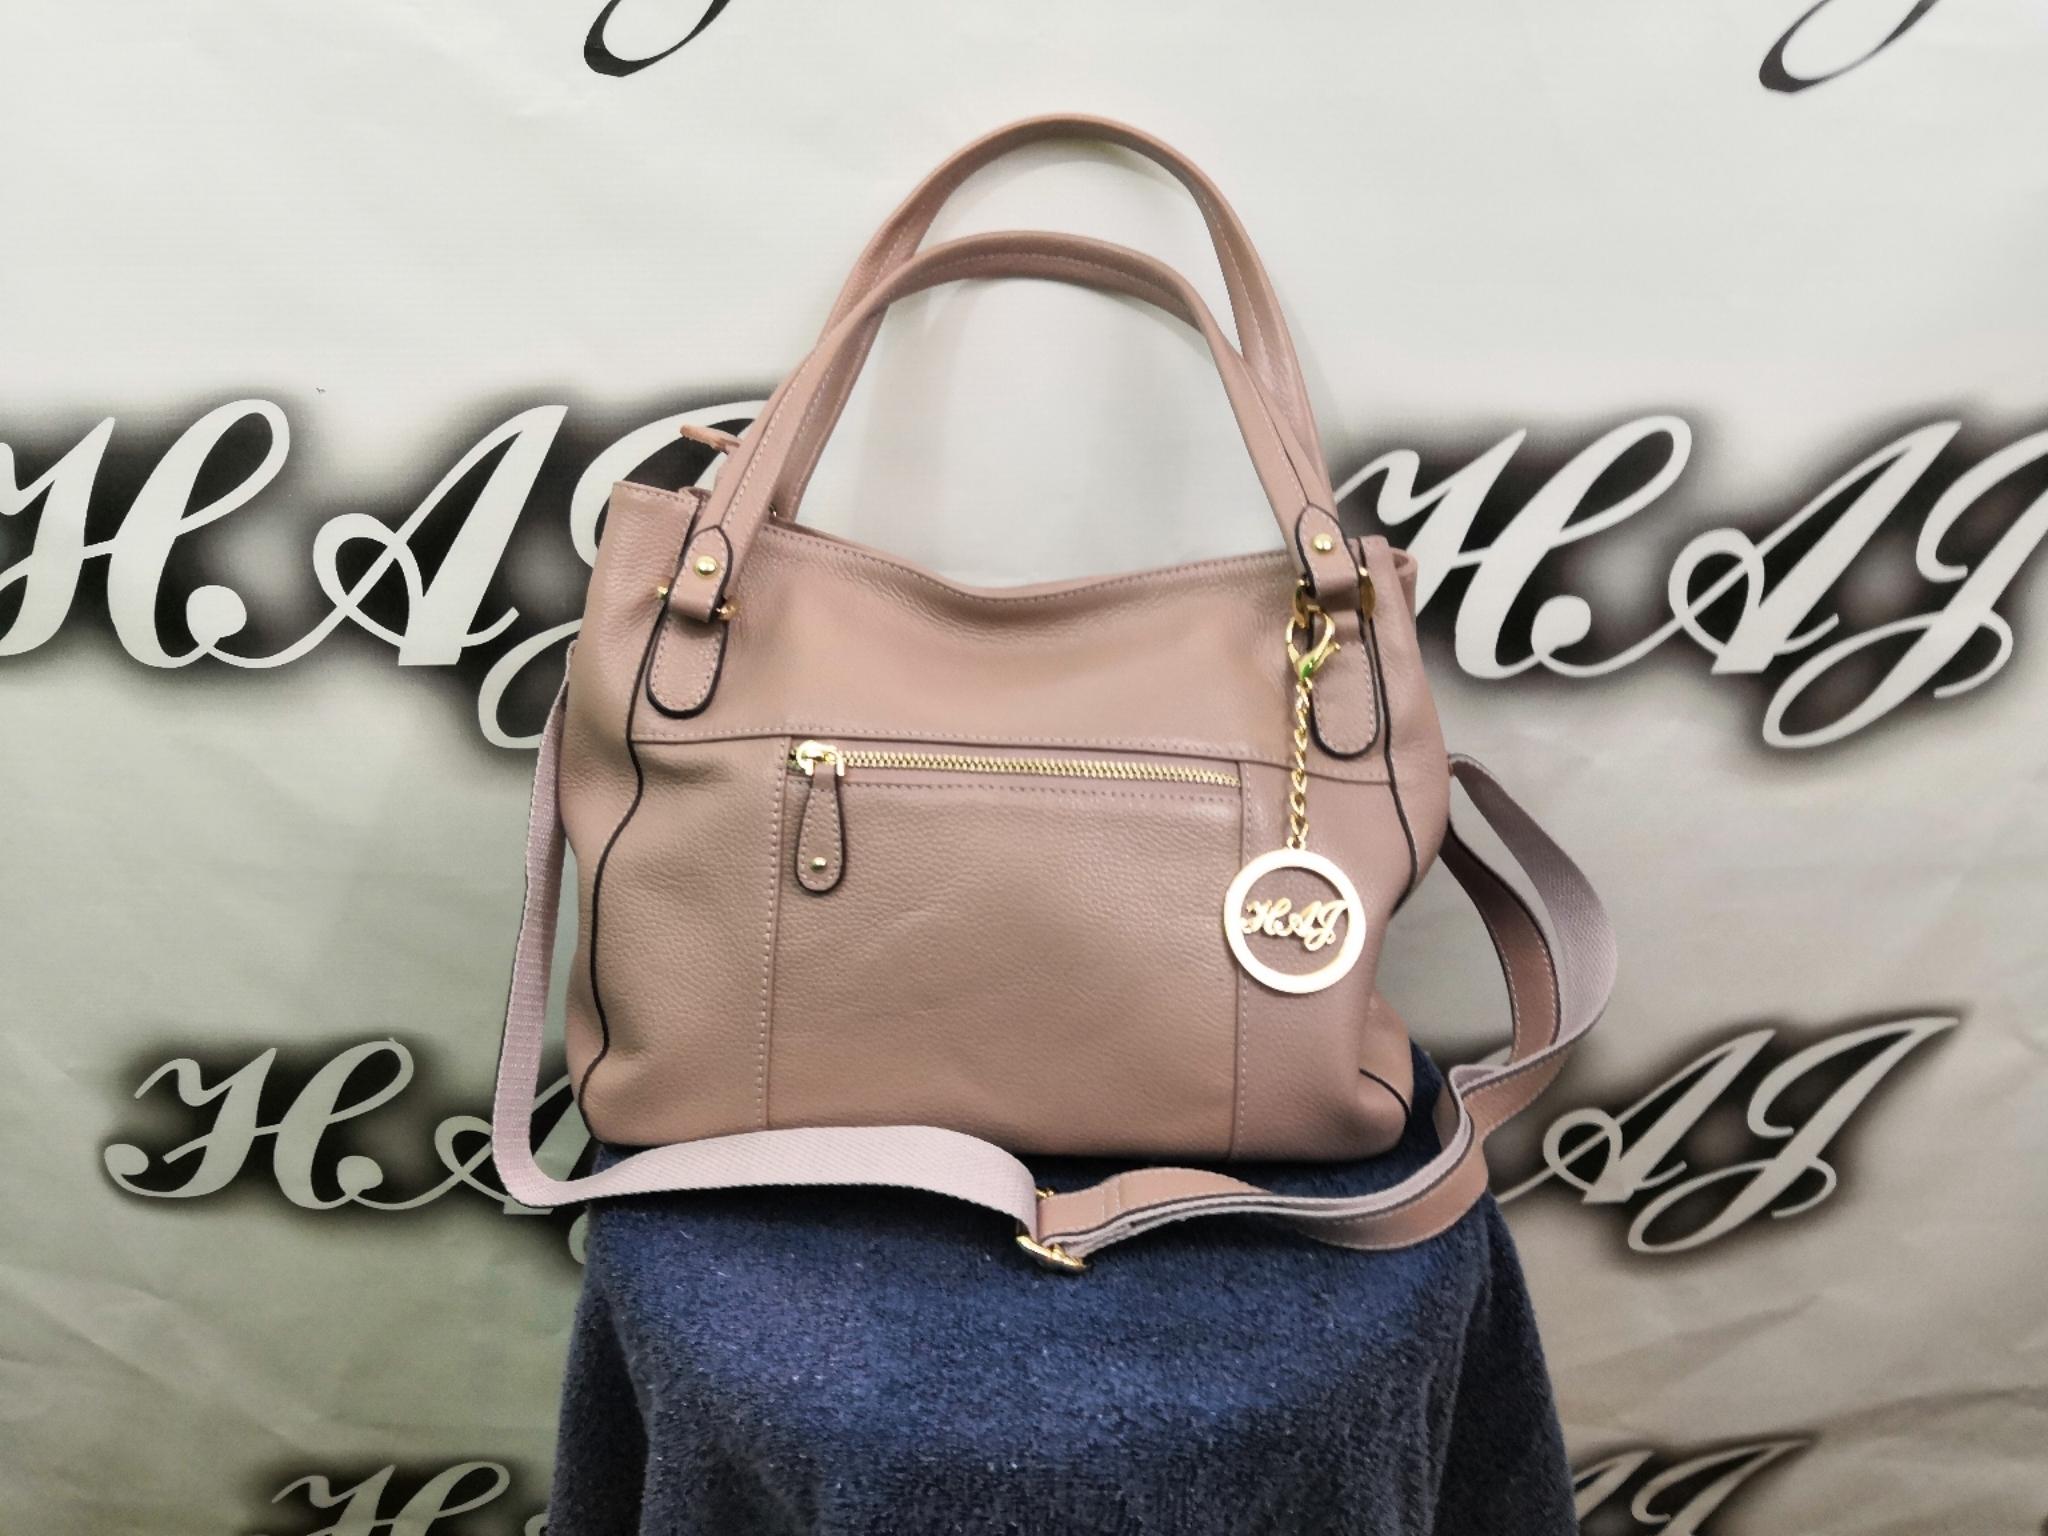 Sexy Pearl purses 10033